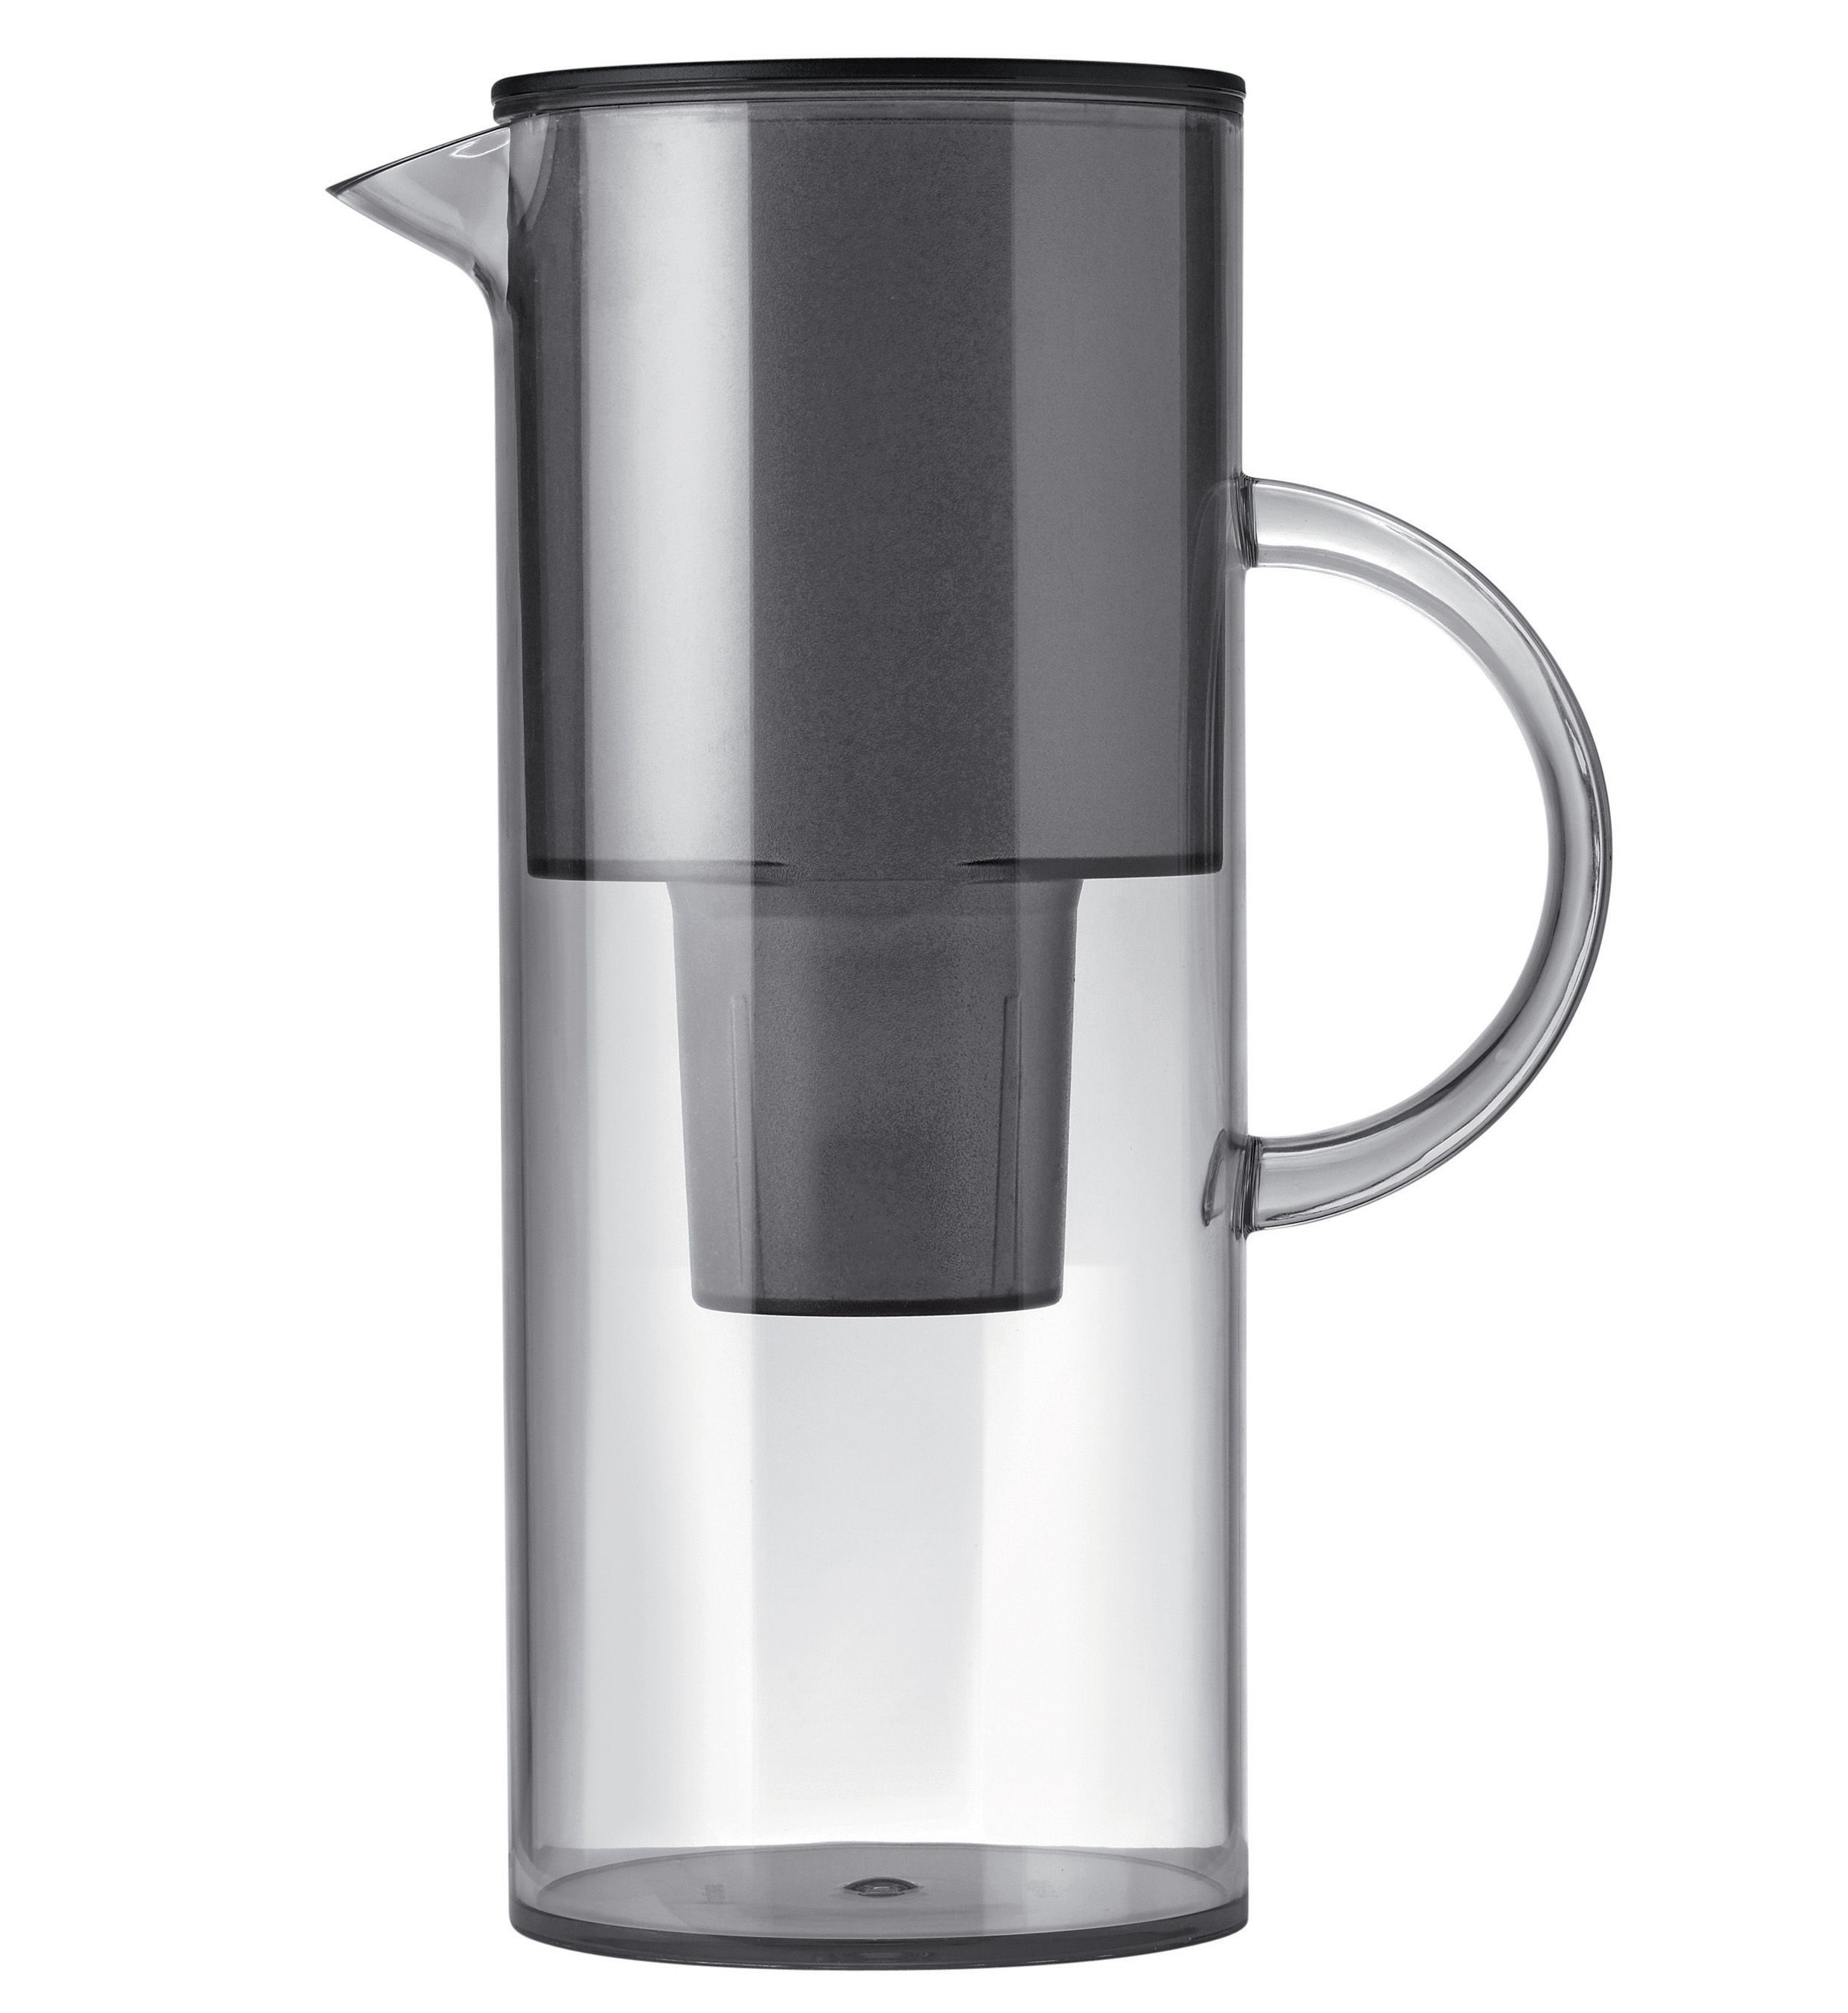 Classic water filter jug with filter smoke grey by stelton - Brita carafe filtrante ...